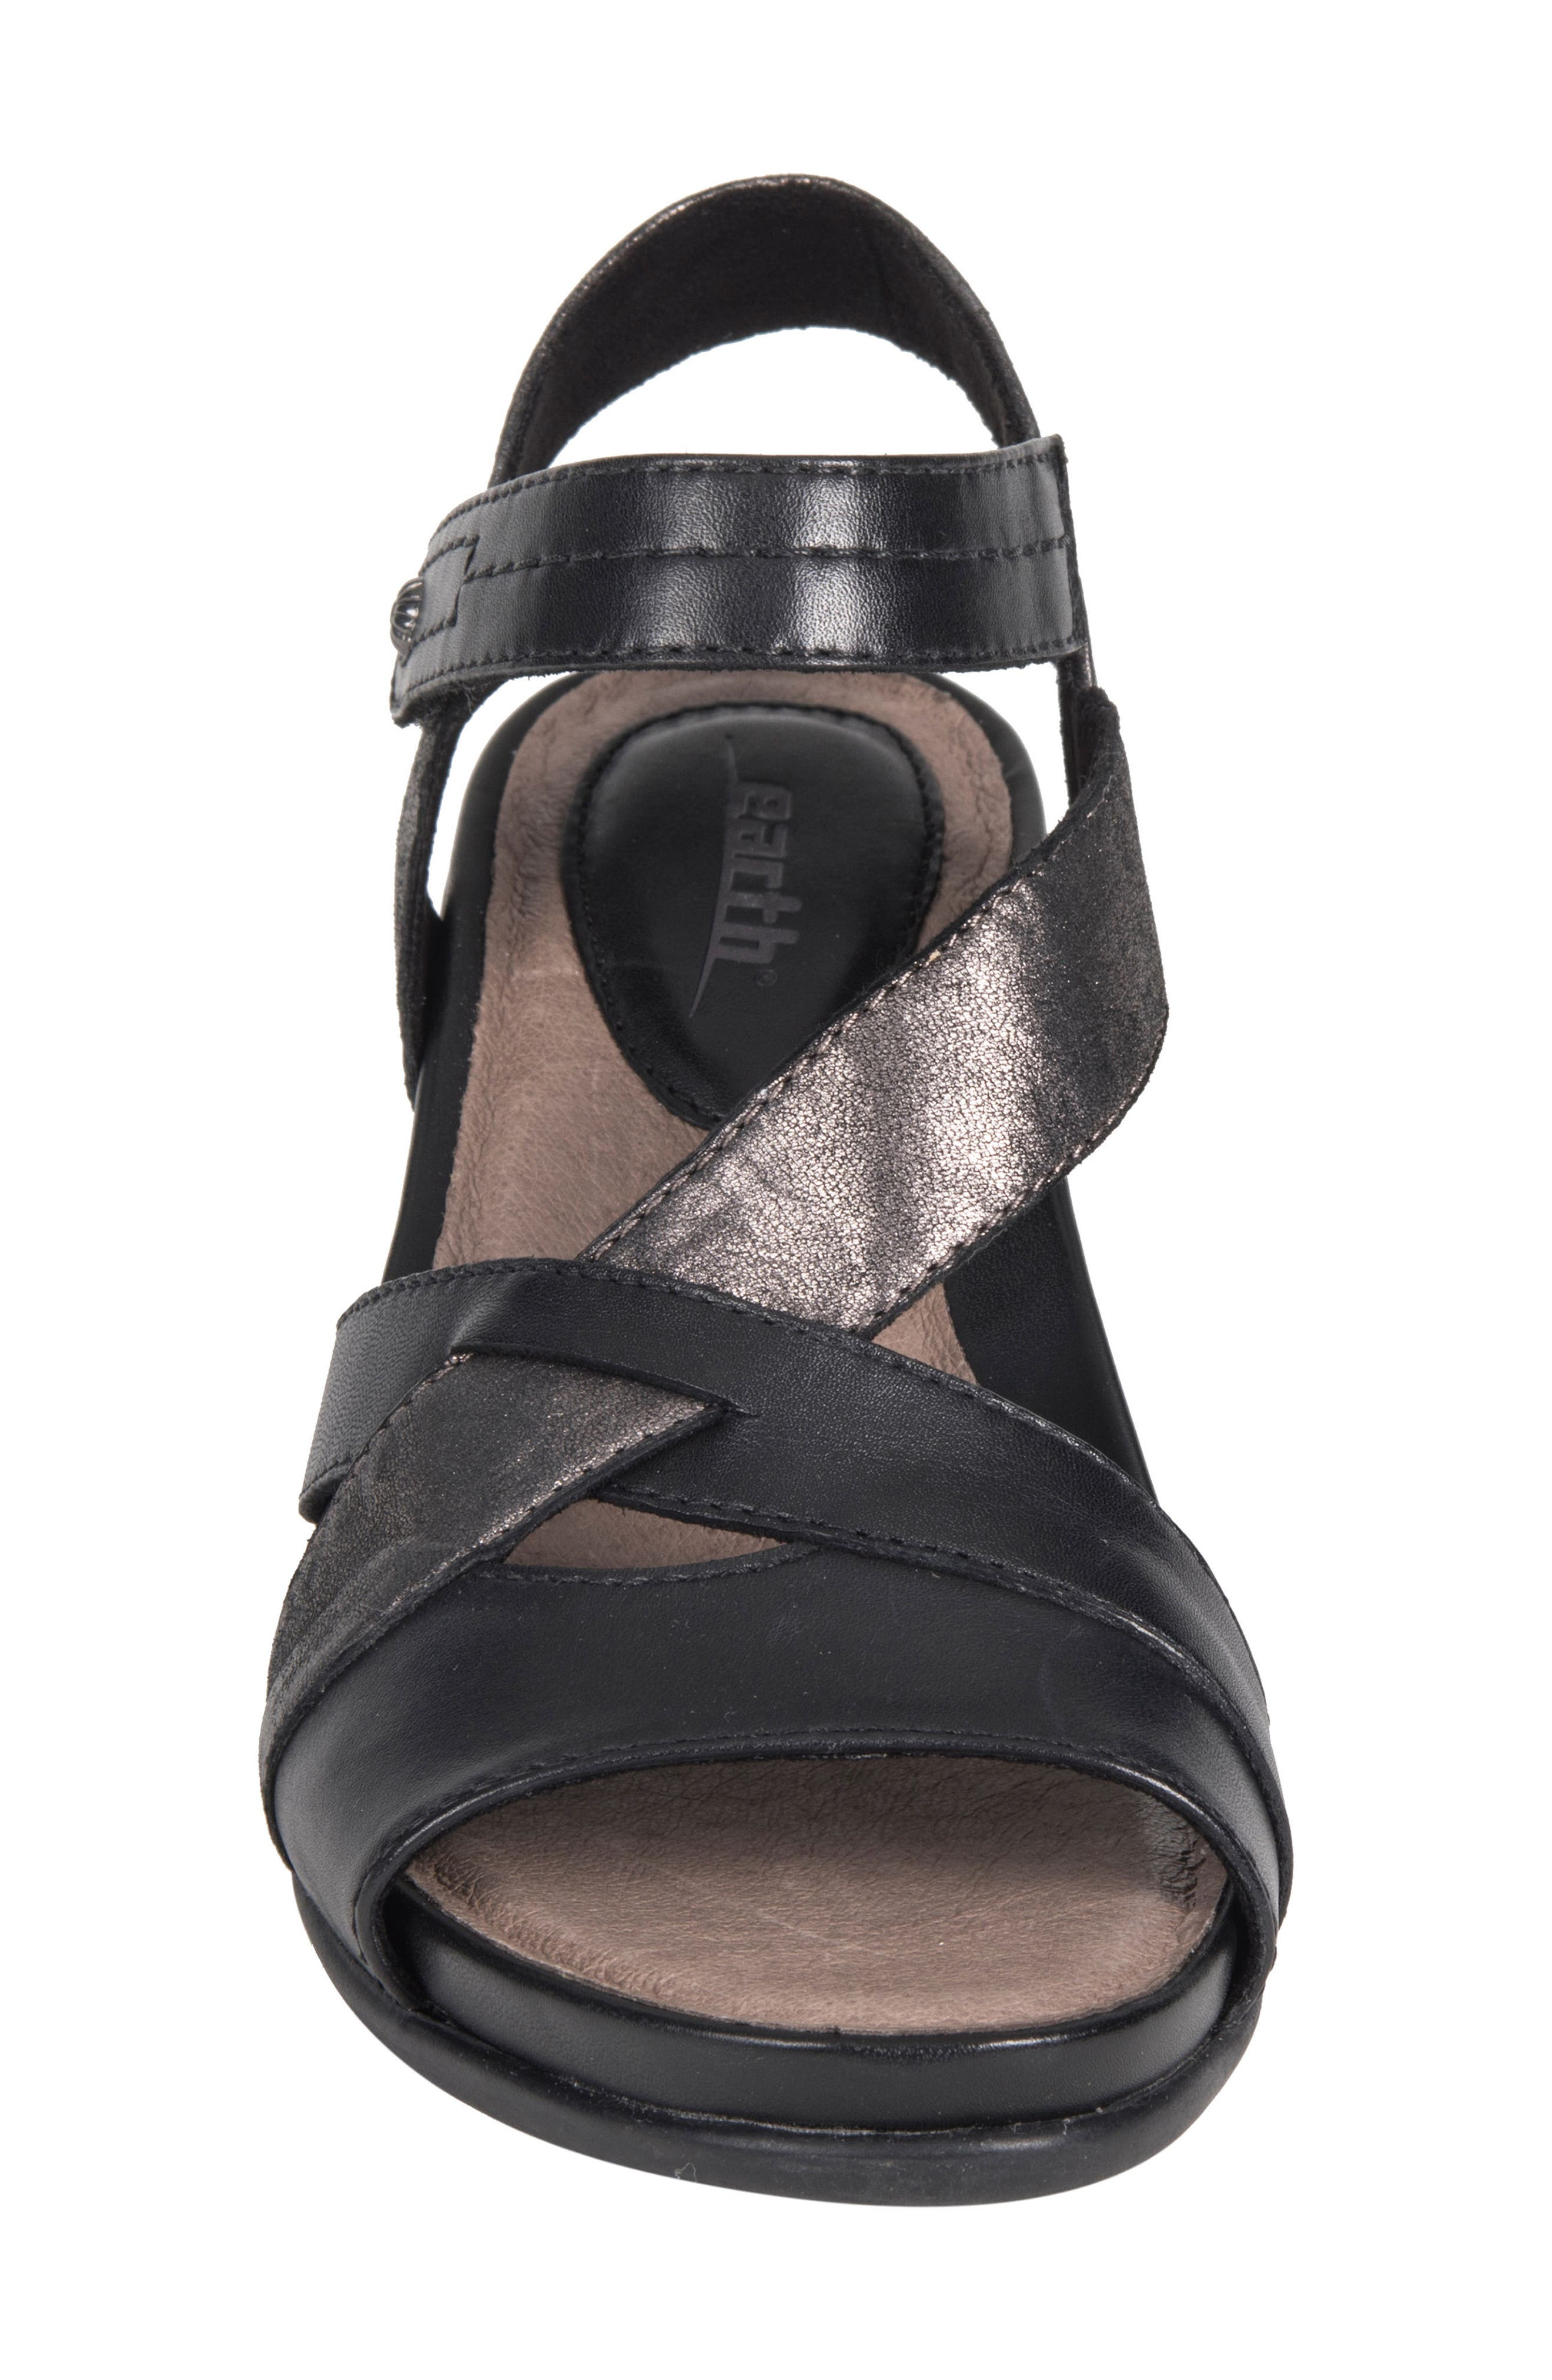 Thistle Wedge Sandal,                             Alternate thumbnail 9, color,